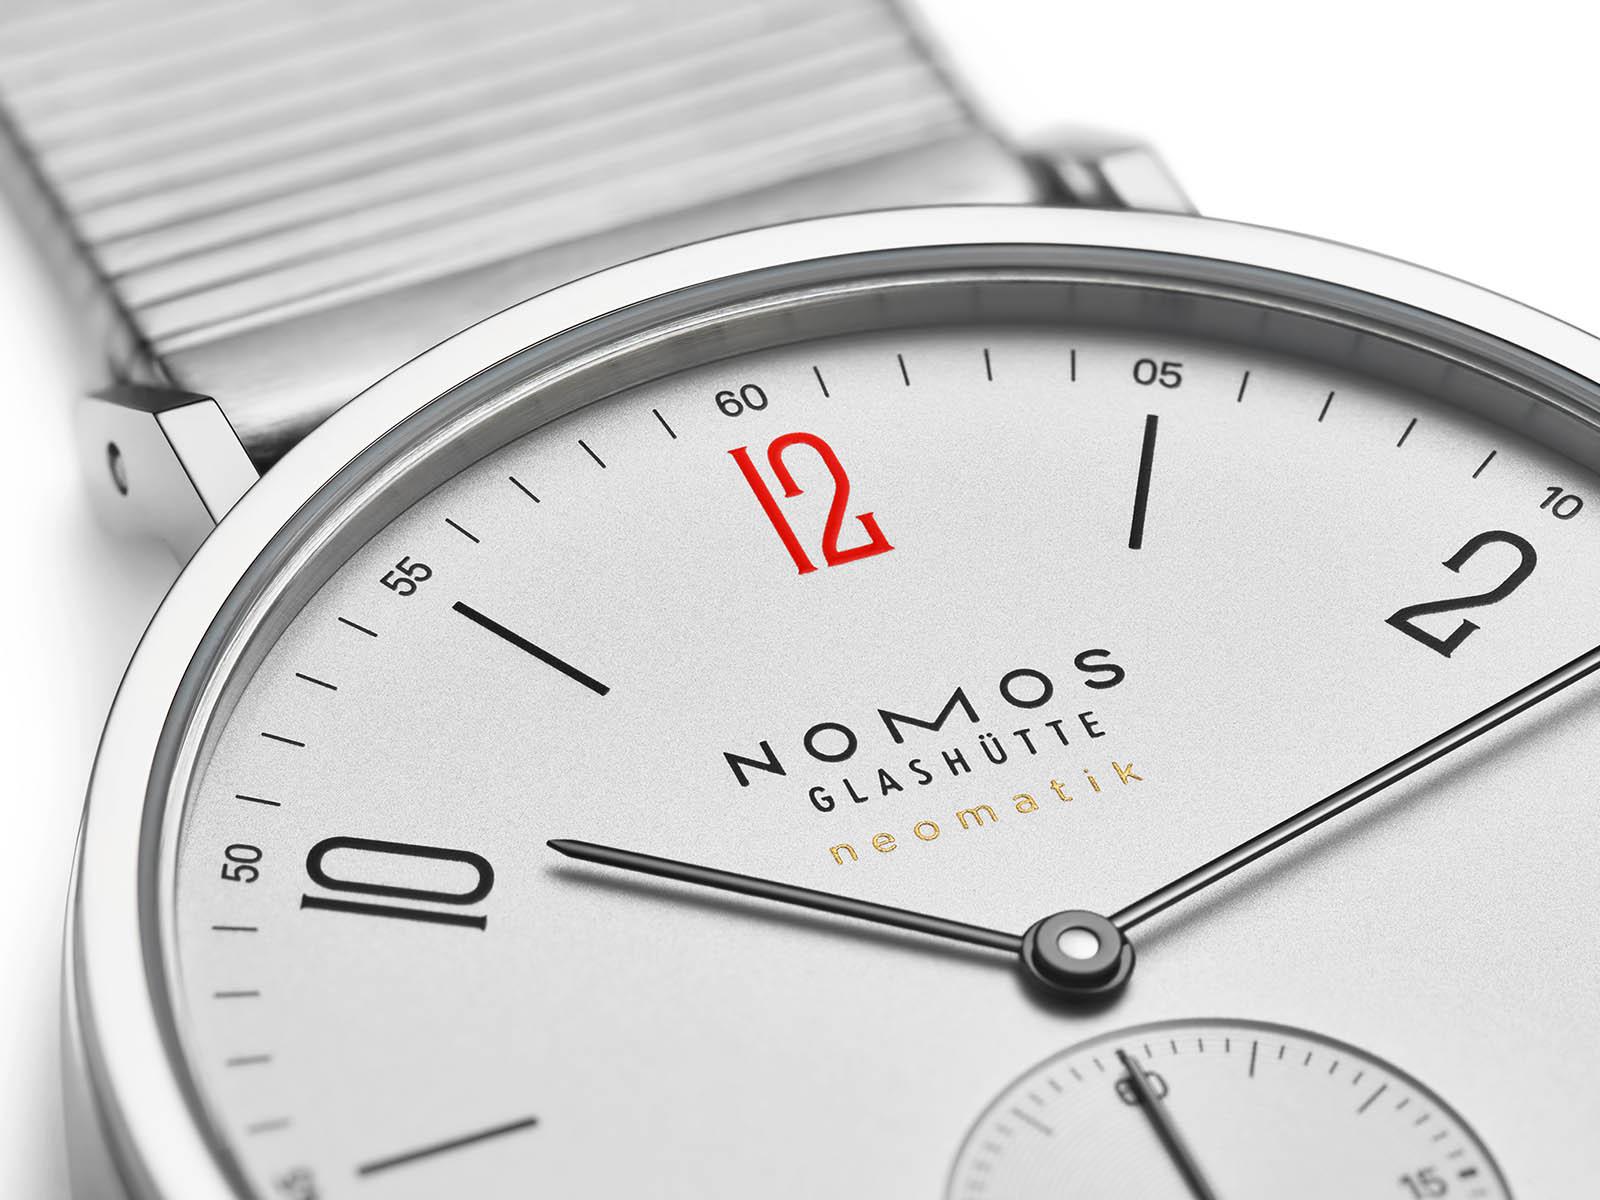 140-s2-nomos-glashutte-tangente-neomatik-medecins-sans-frontieres-2.jpg